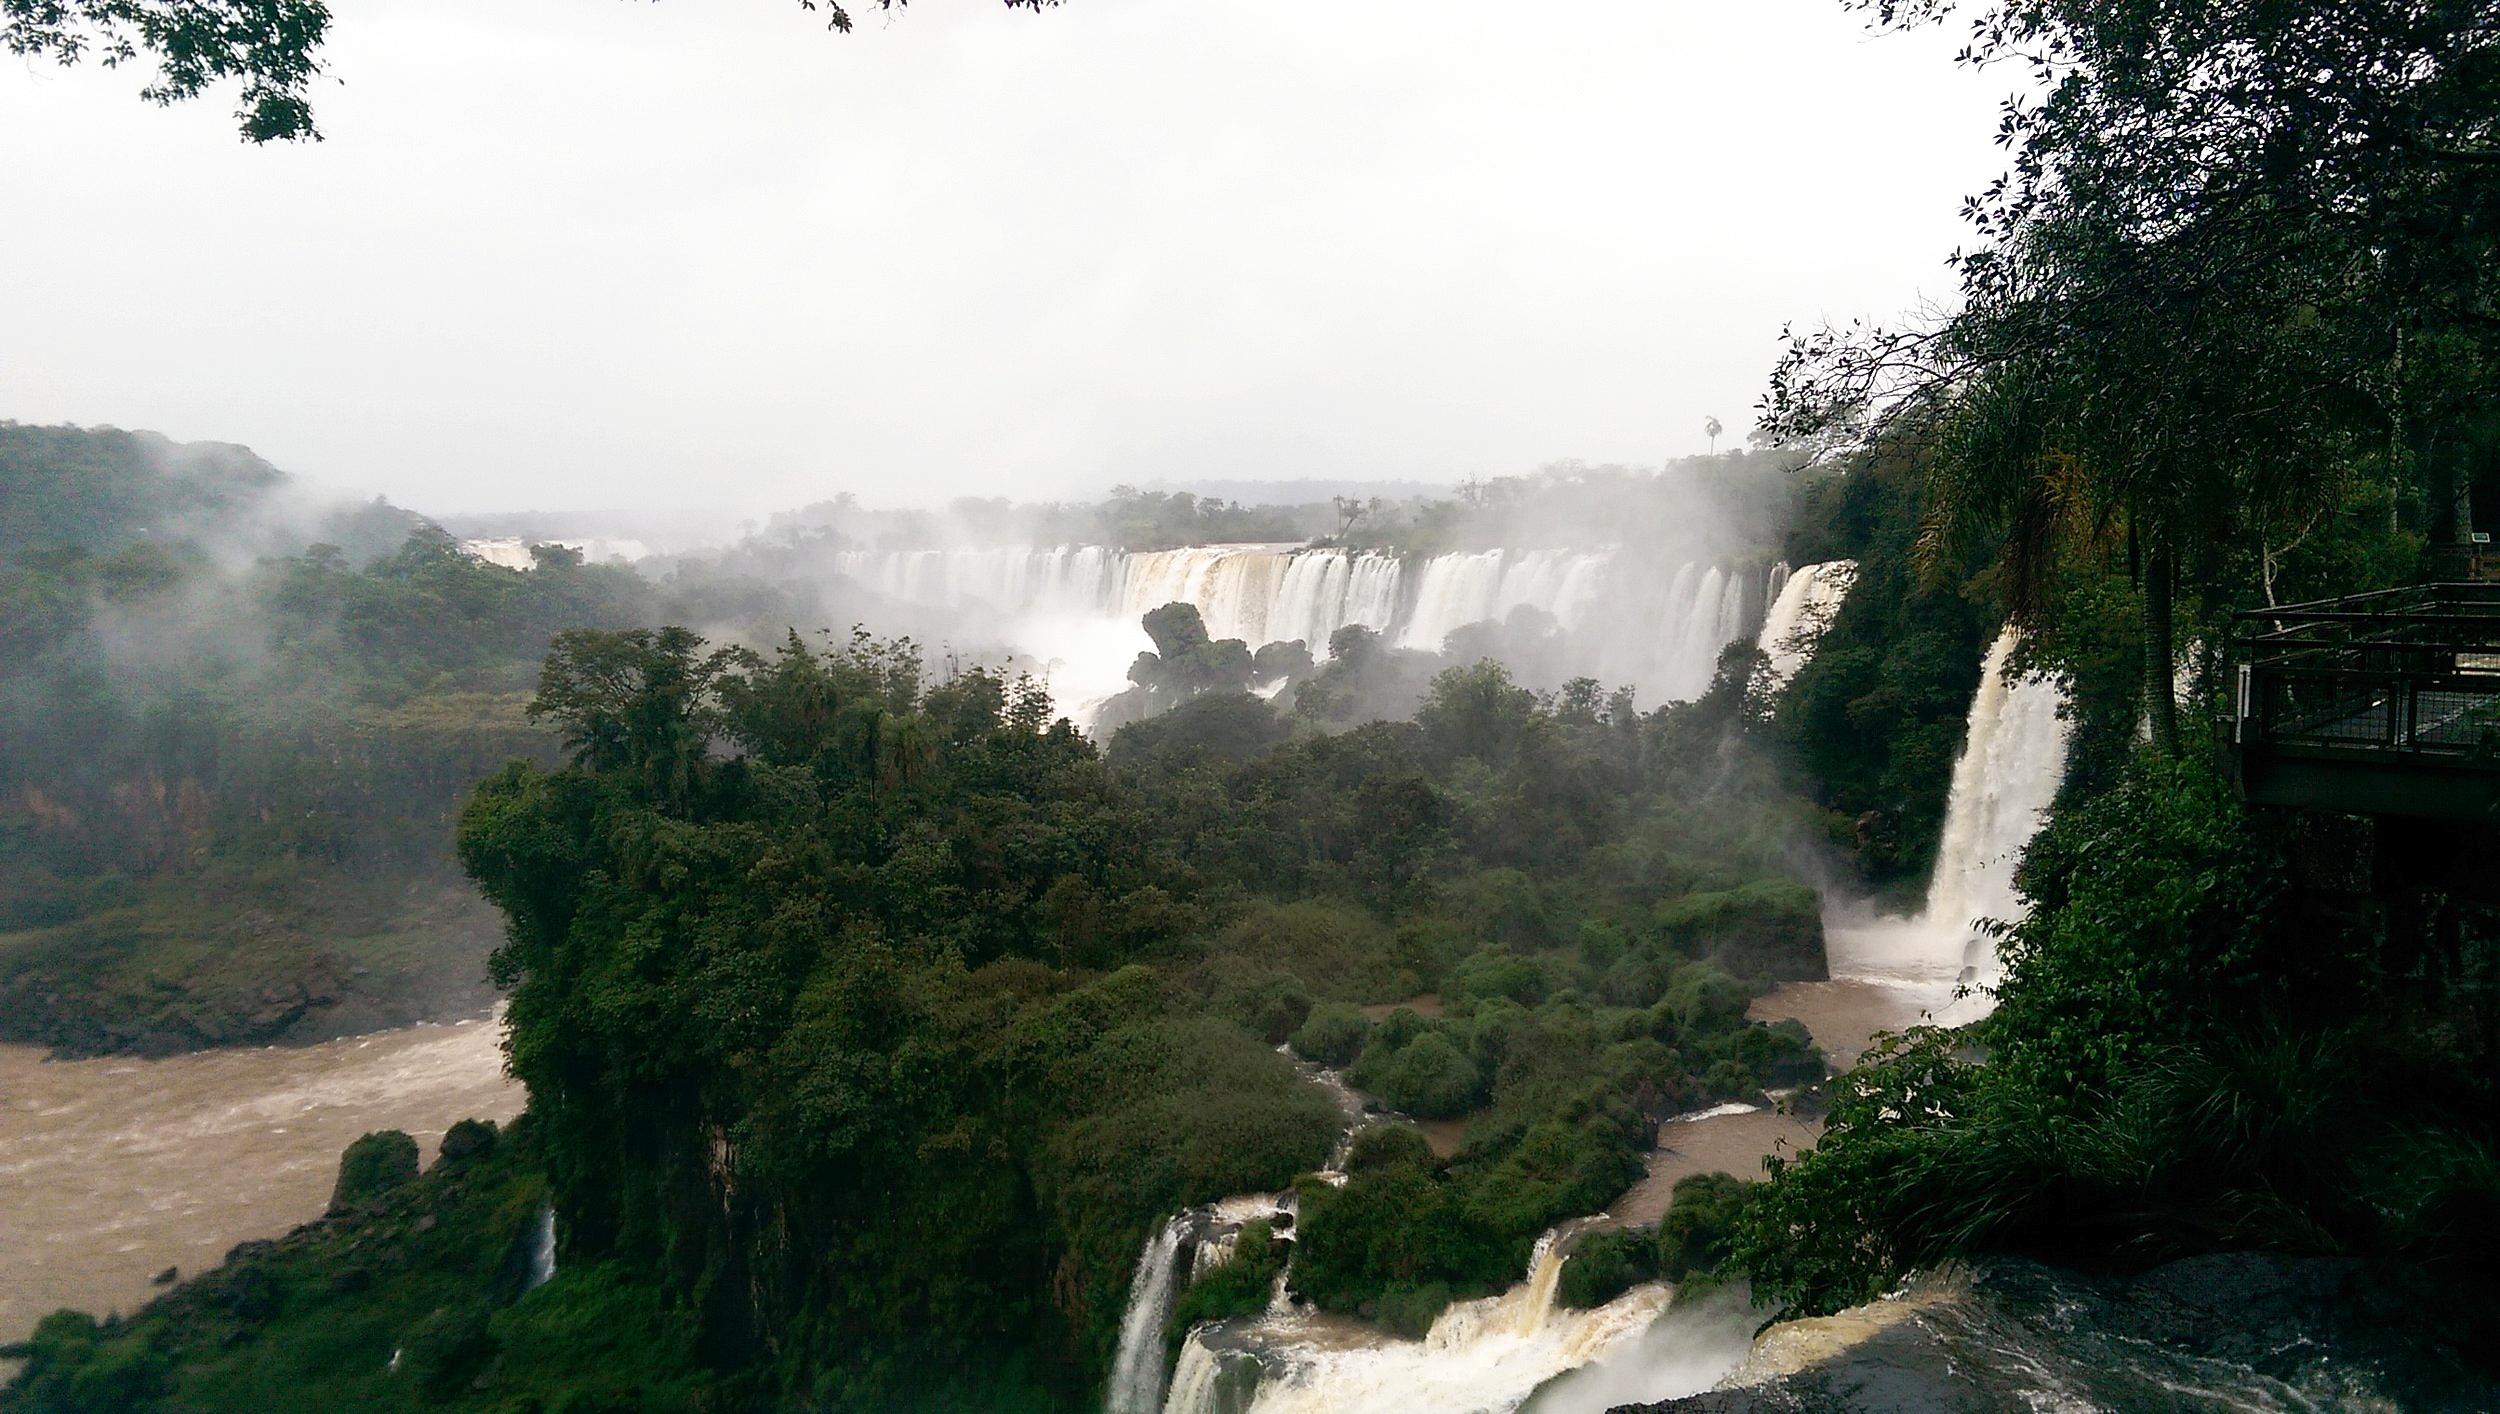 Behold, Las Cataratas del Iguazu